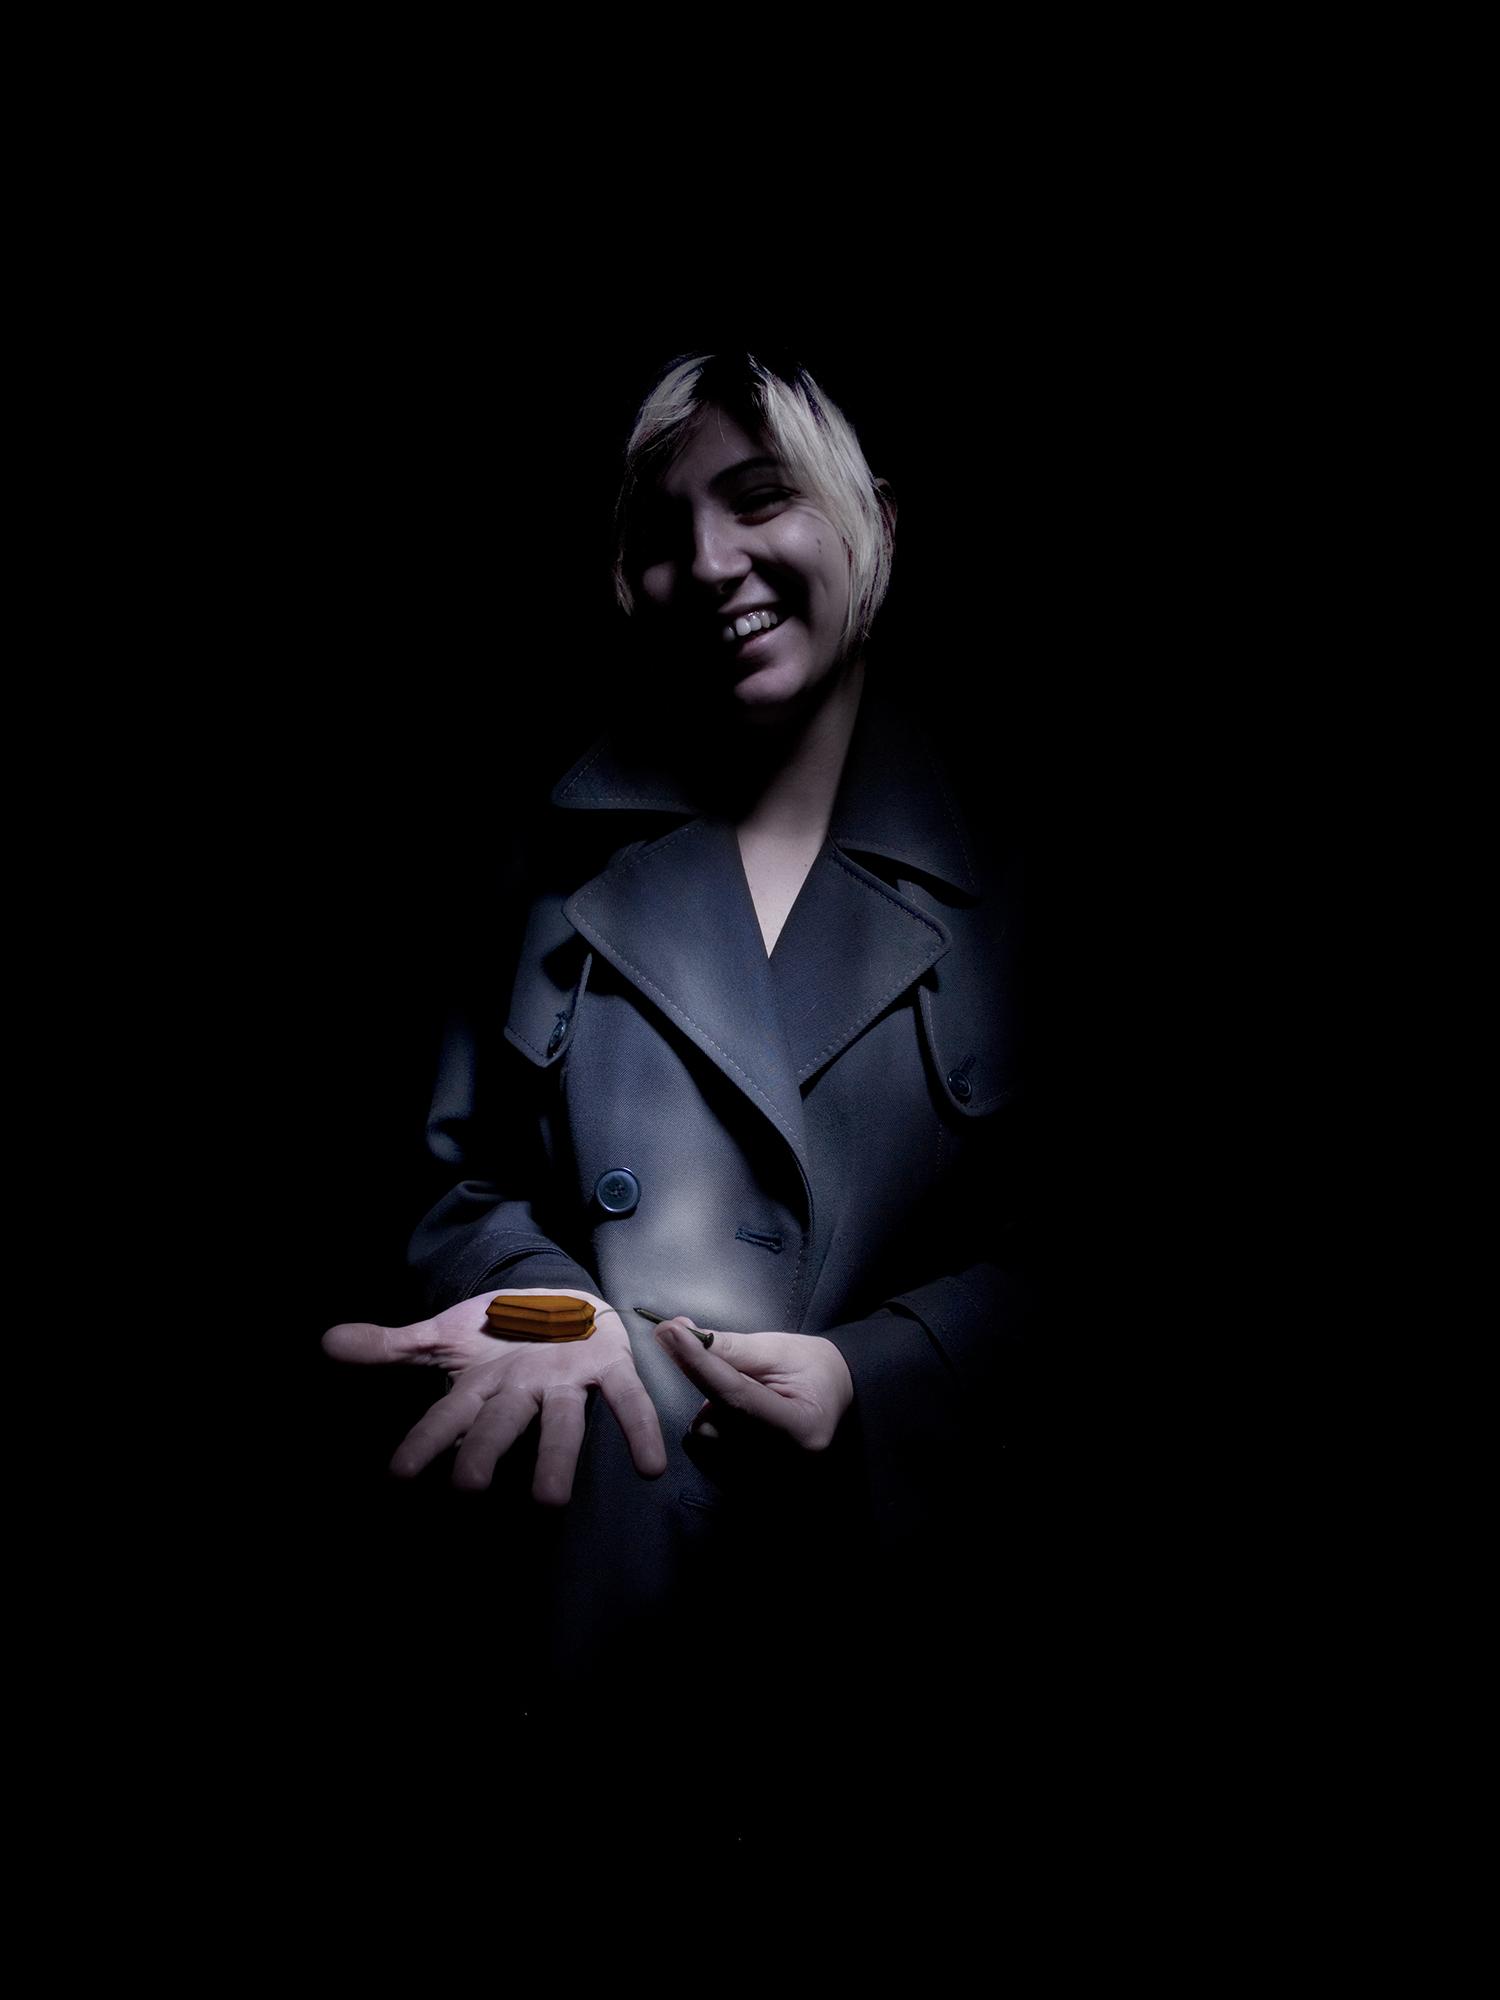 ogni sorriso toglie un chiodo alla bara-30CM X 40CM / 50CM X 70CM / 70CM X 100CM – Print on FineArt Baryta Hahnemühle / dibond-©2009 – Edition of 5